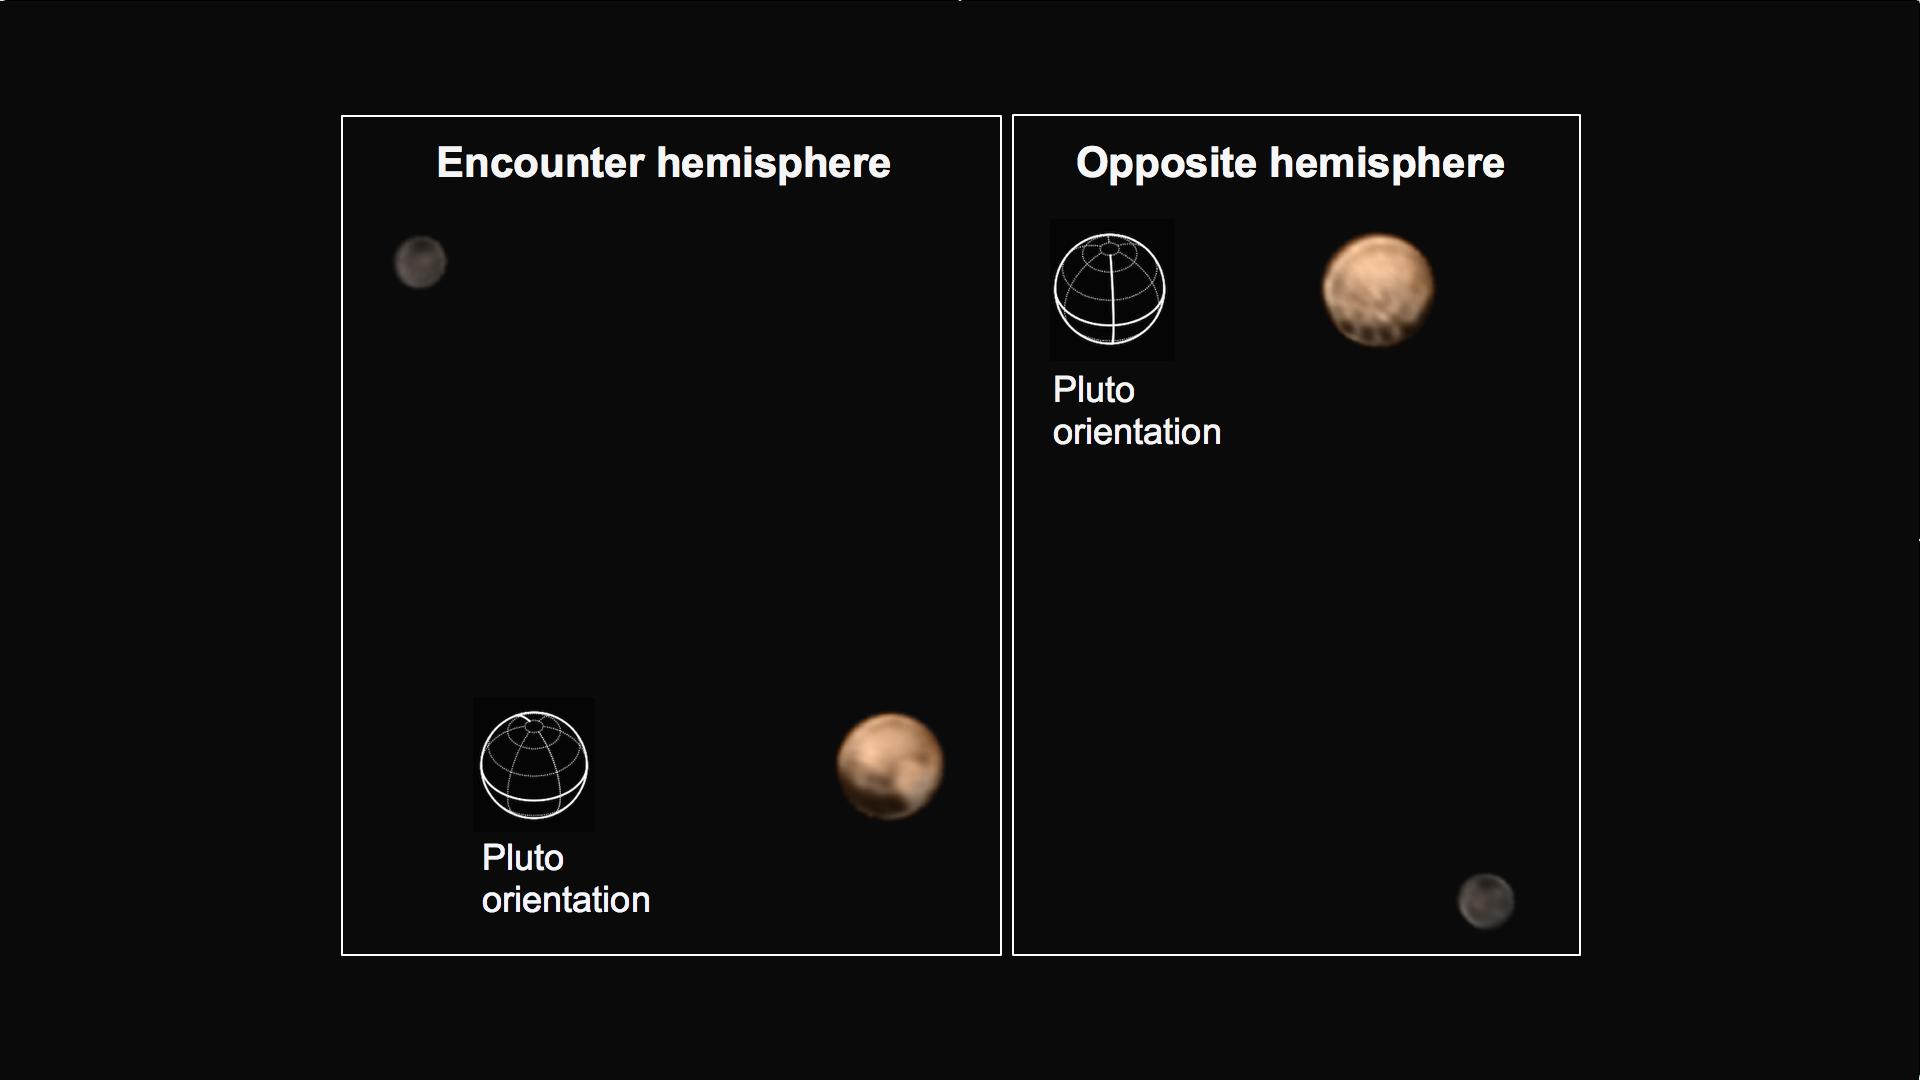 Плутон и Харон с борта New Horizons, 2 июля 2015 года.